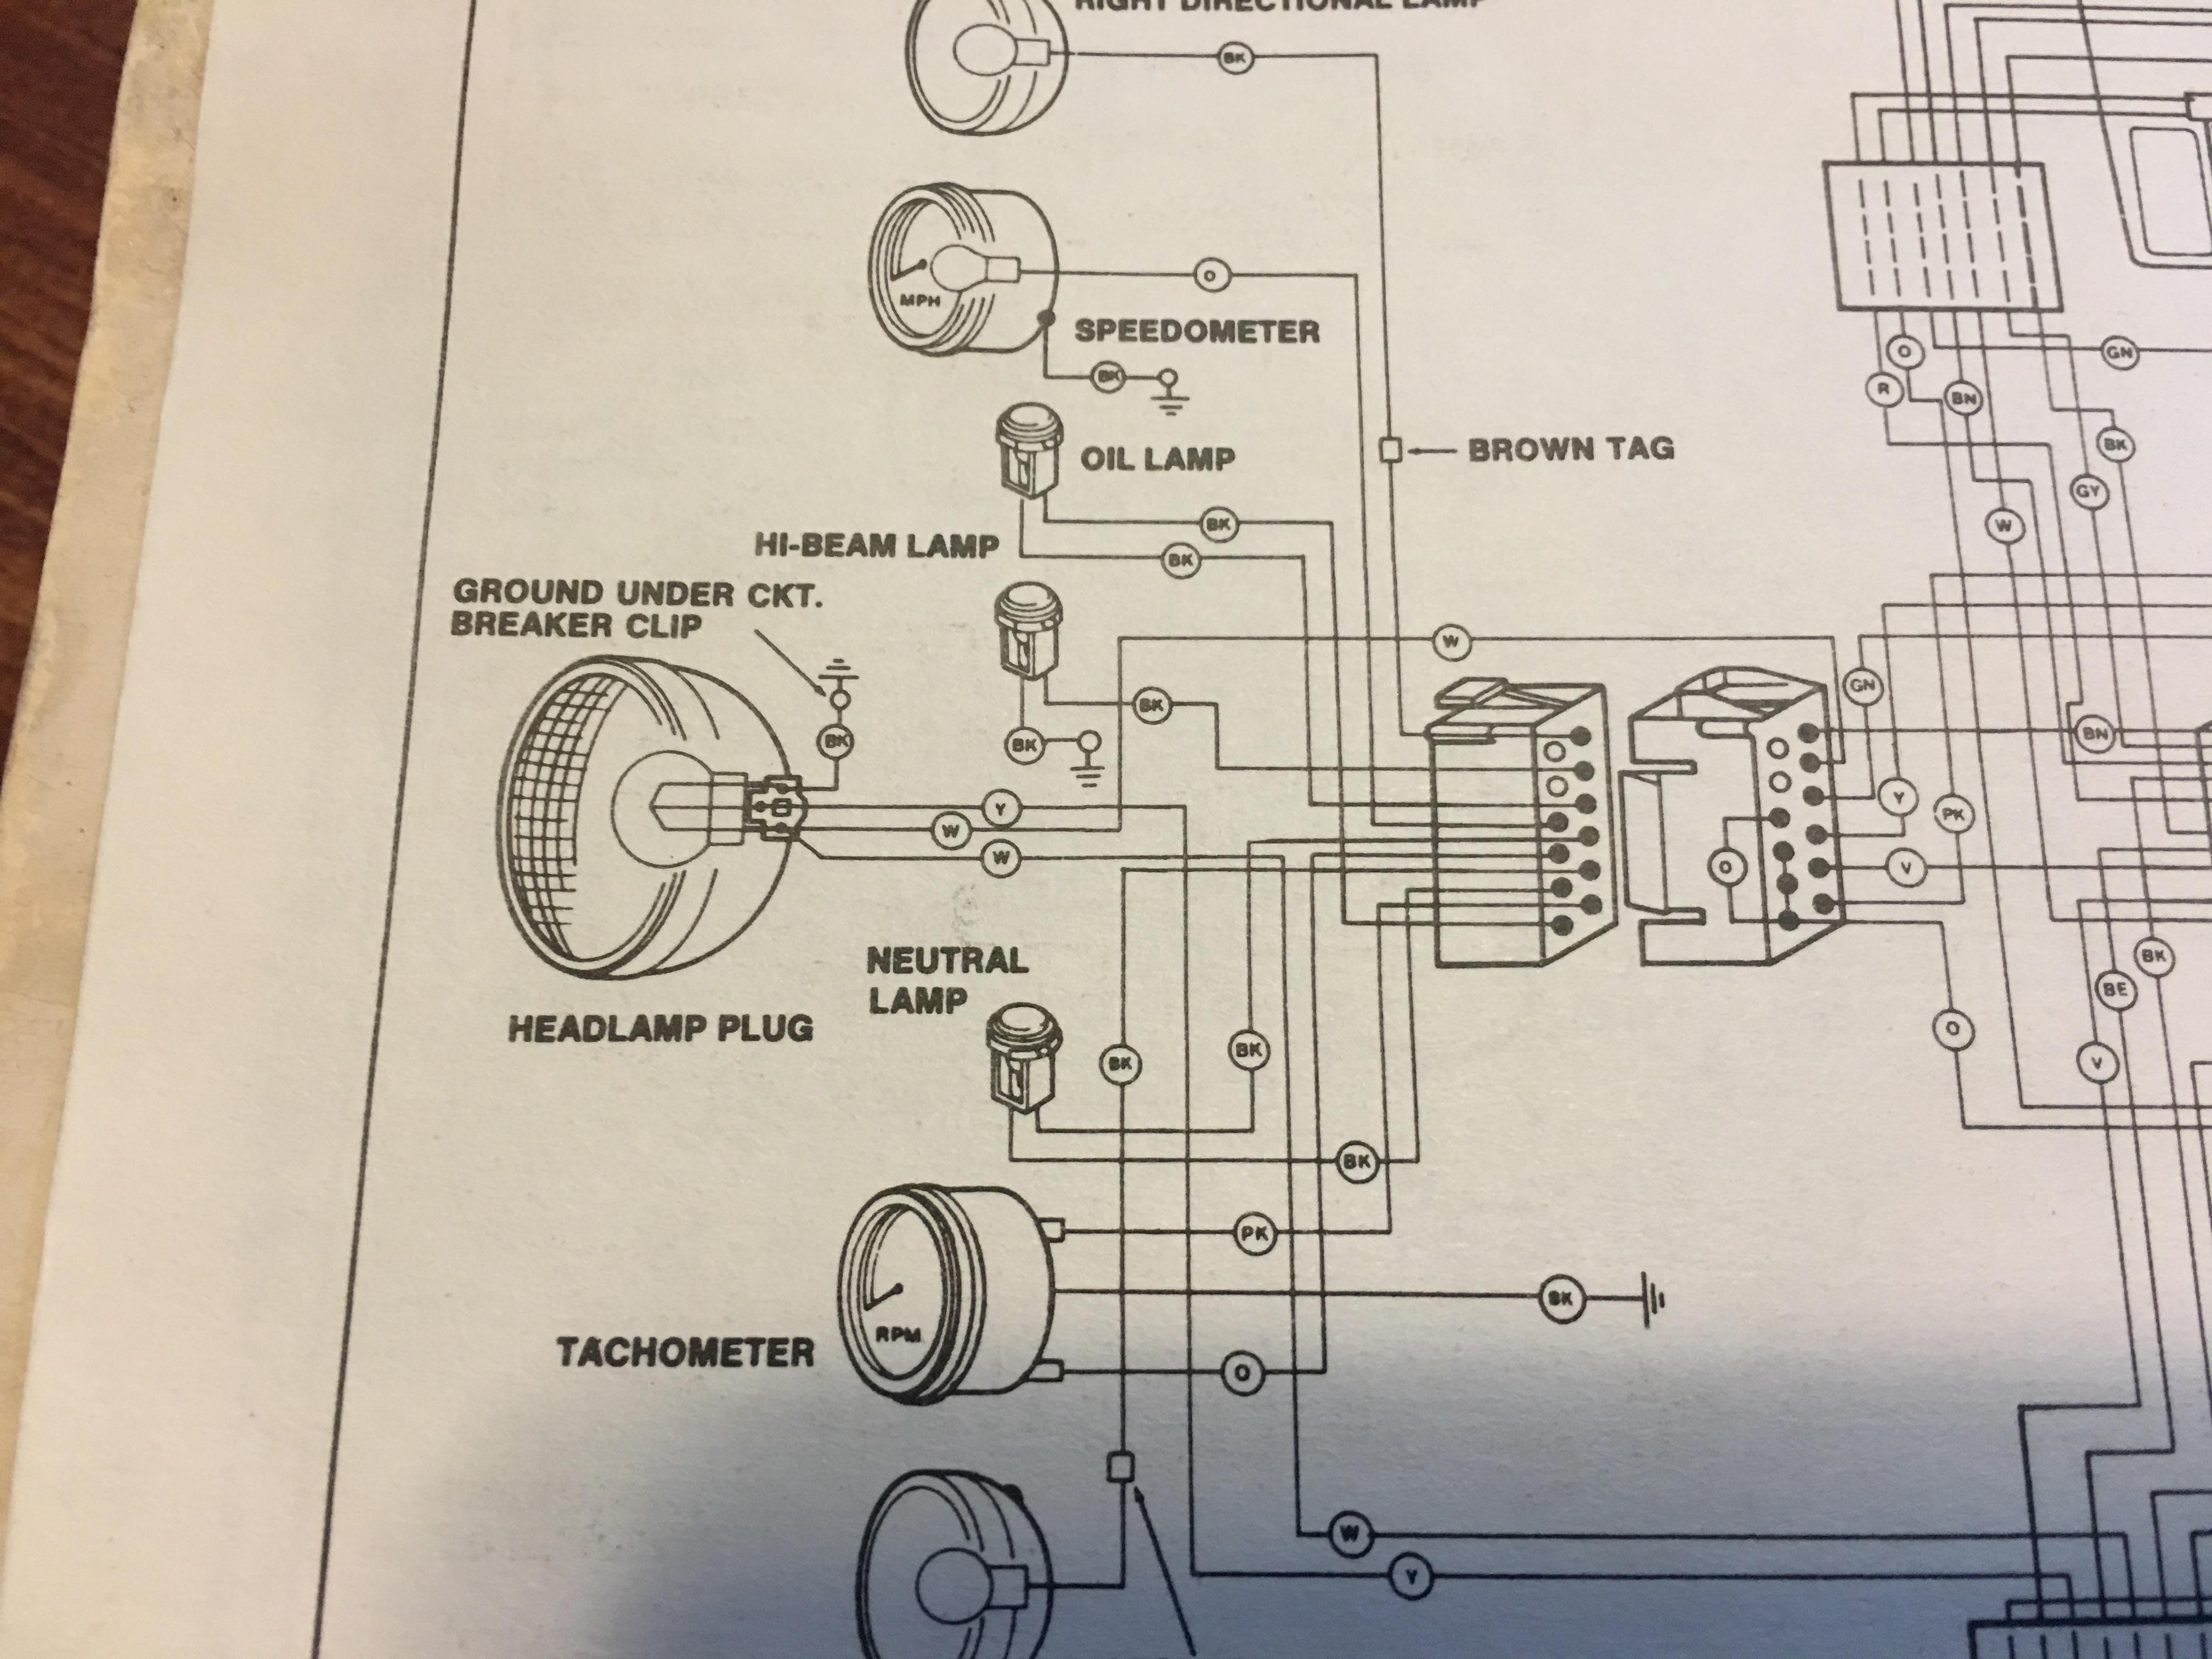 1990 Harley Fxrs Wiring Diagram